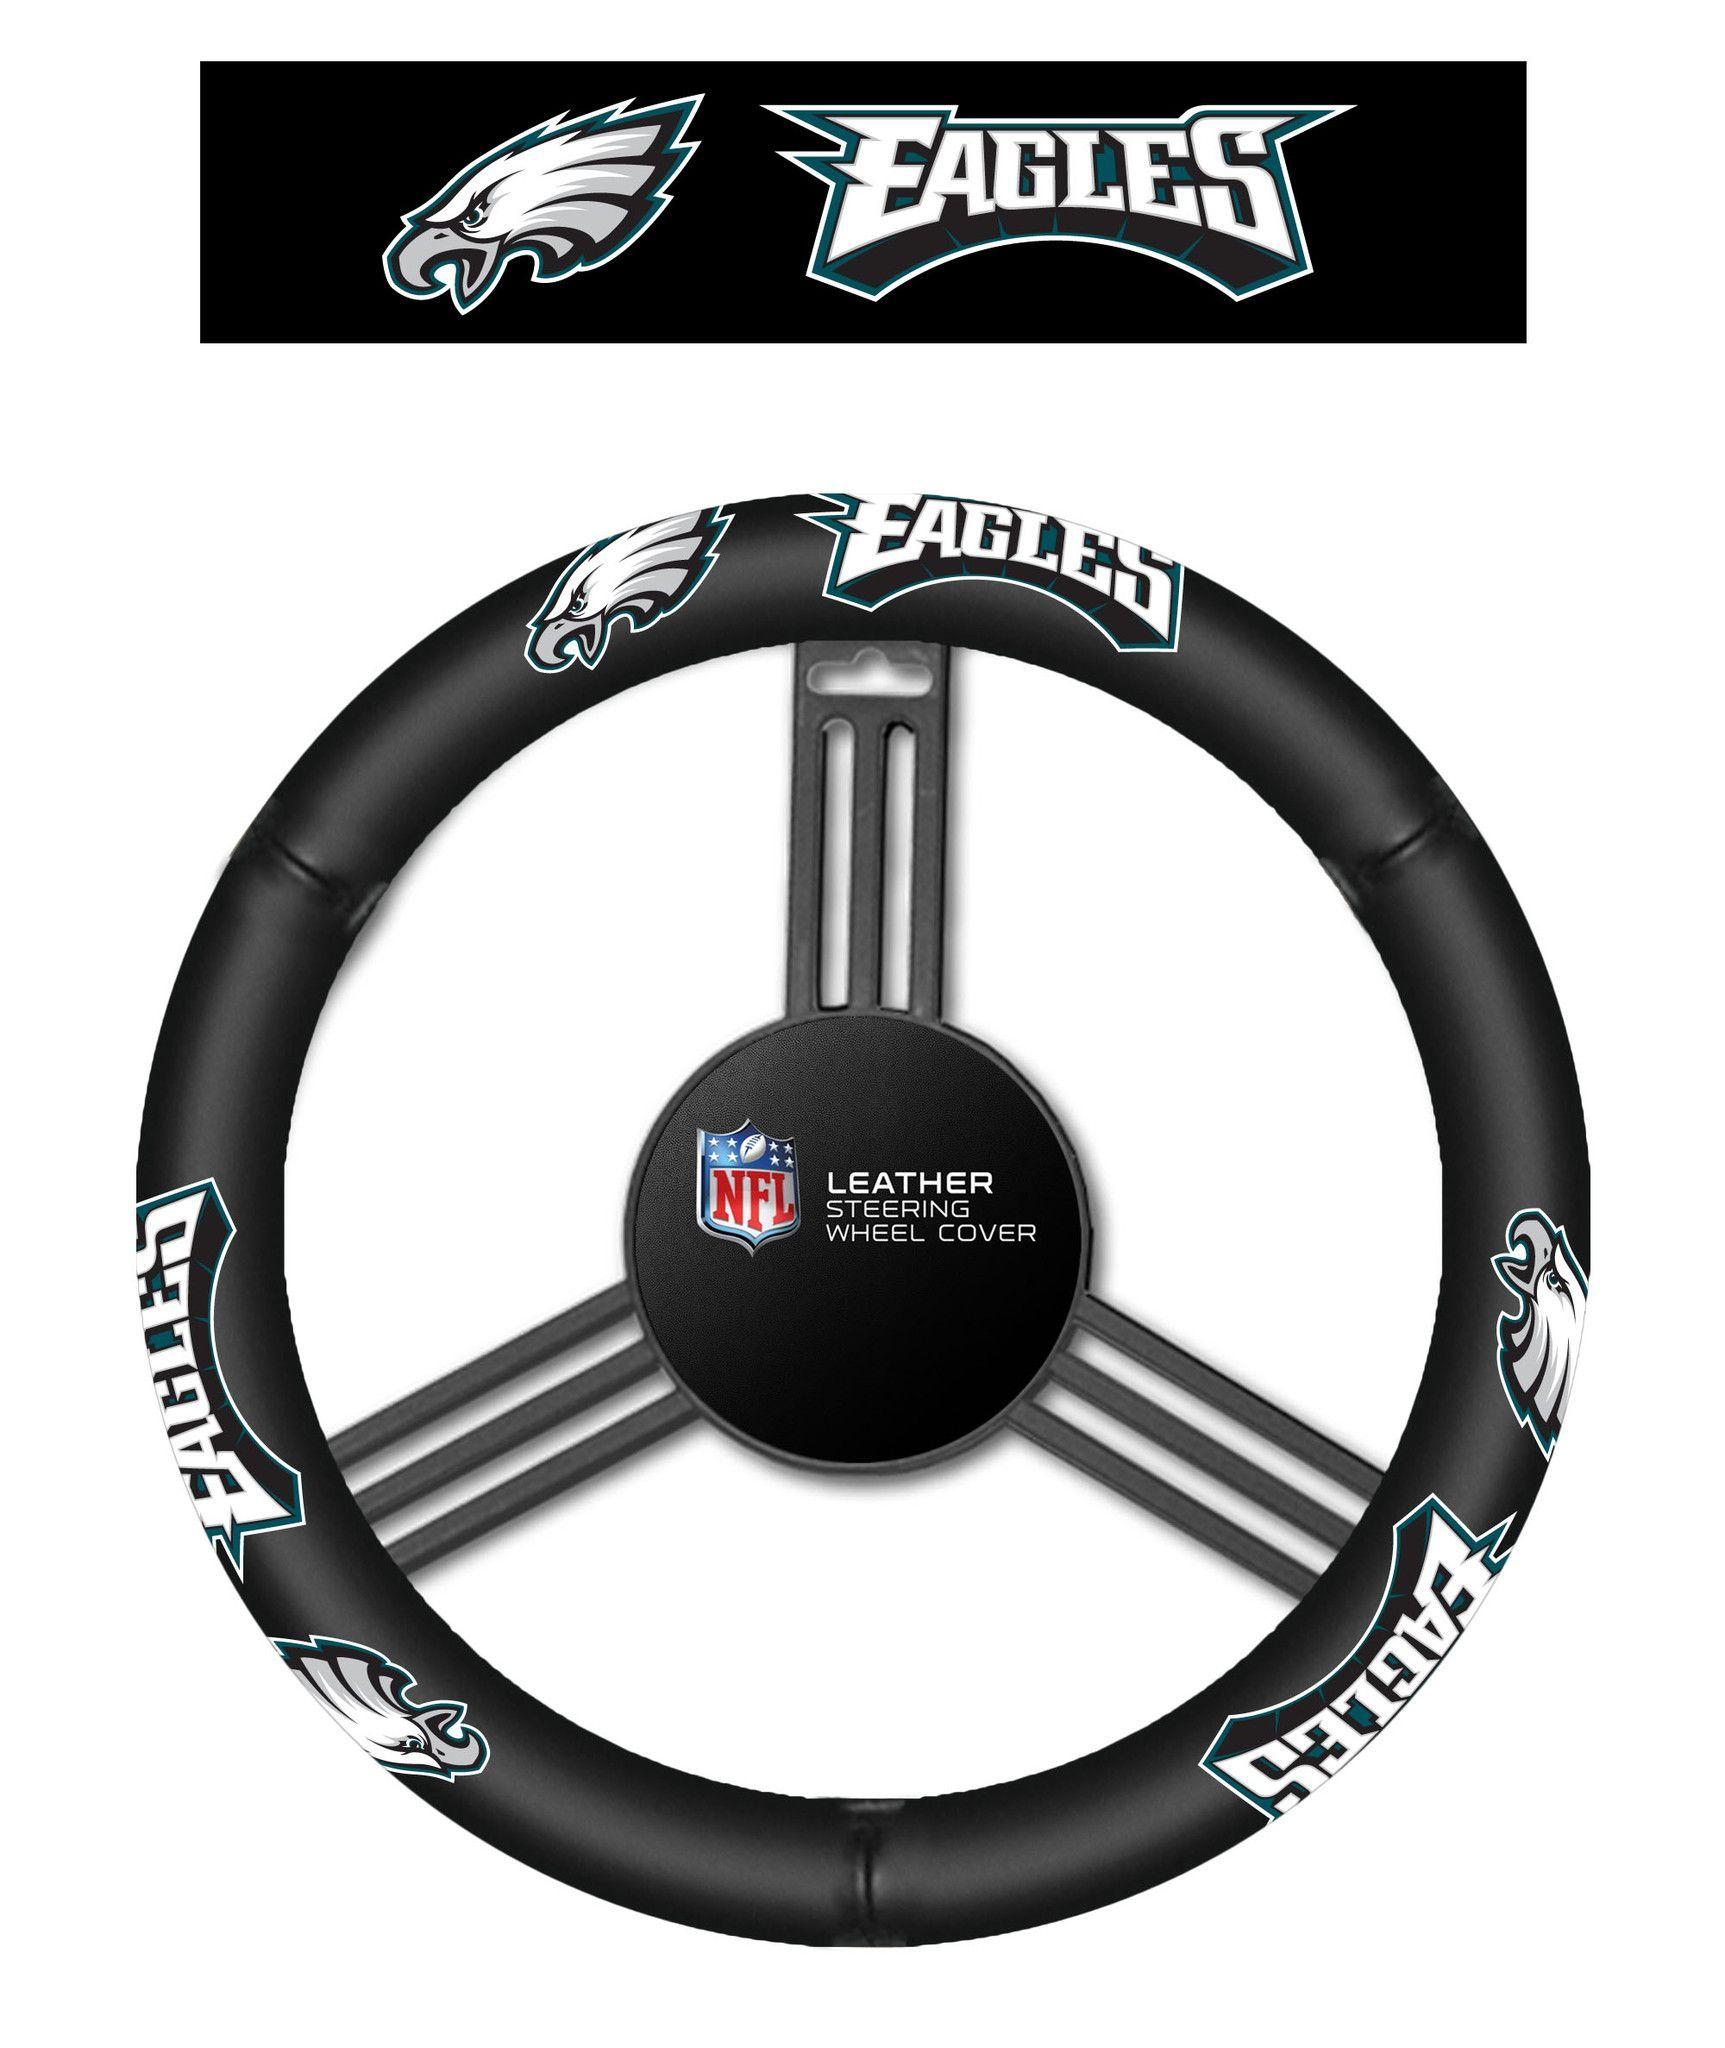 Philadelphis Eagles Leather Steering Wheel Cover